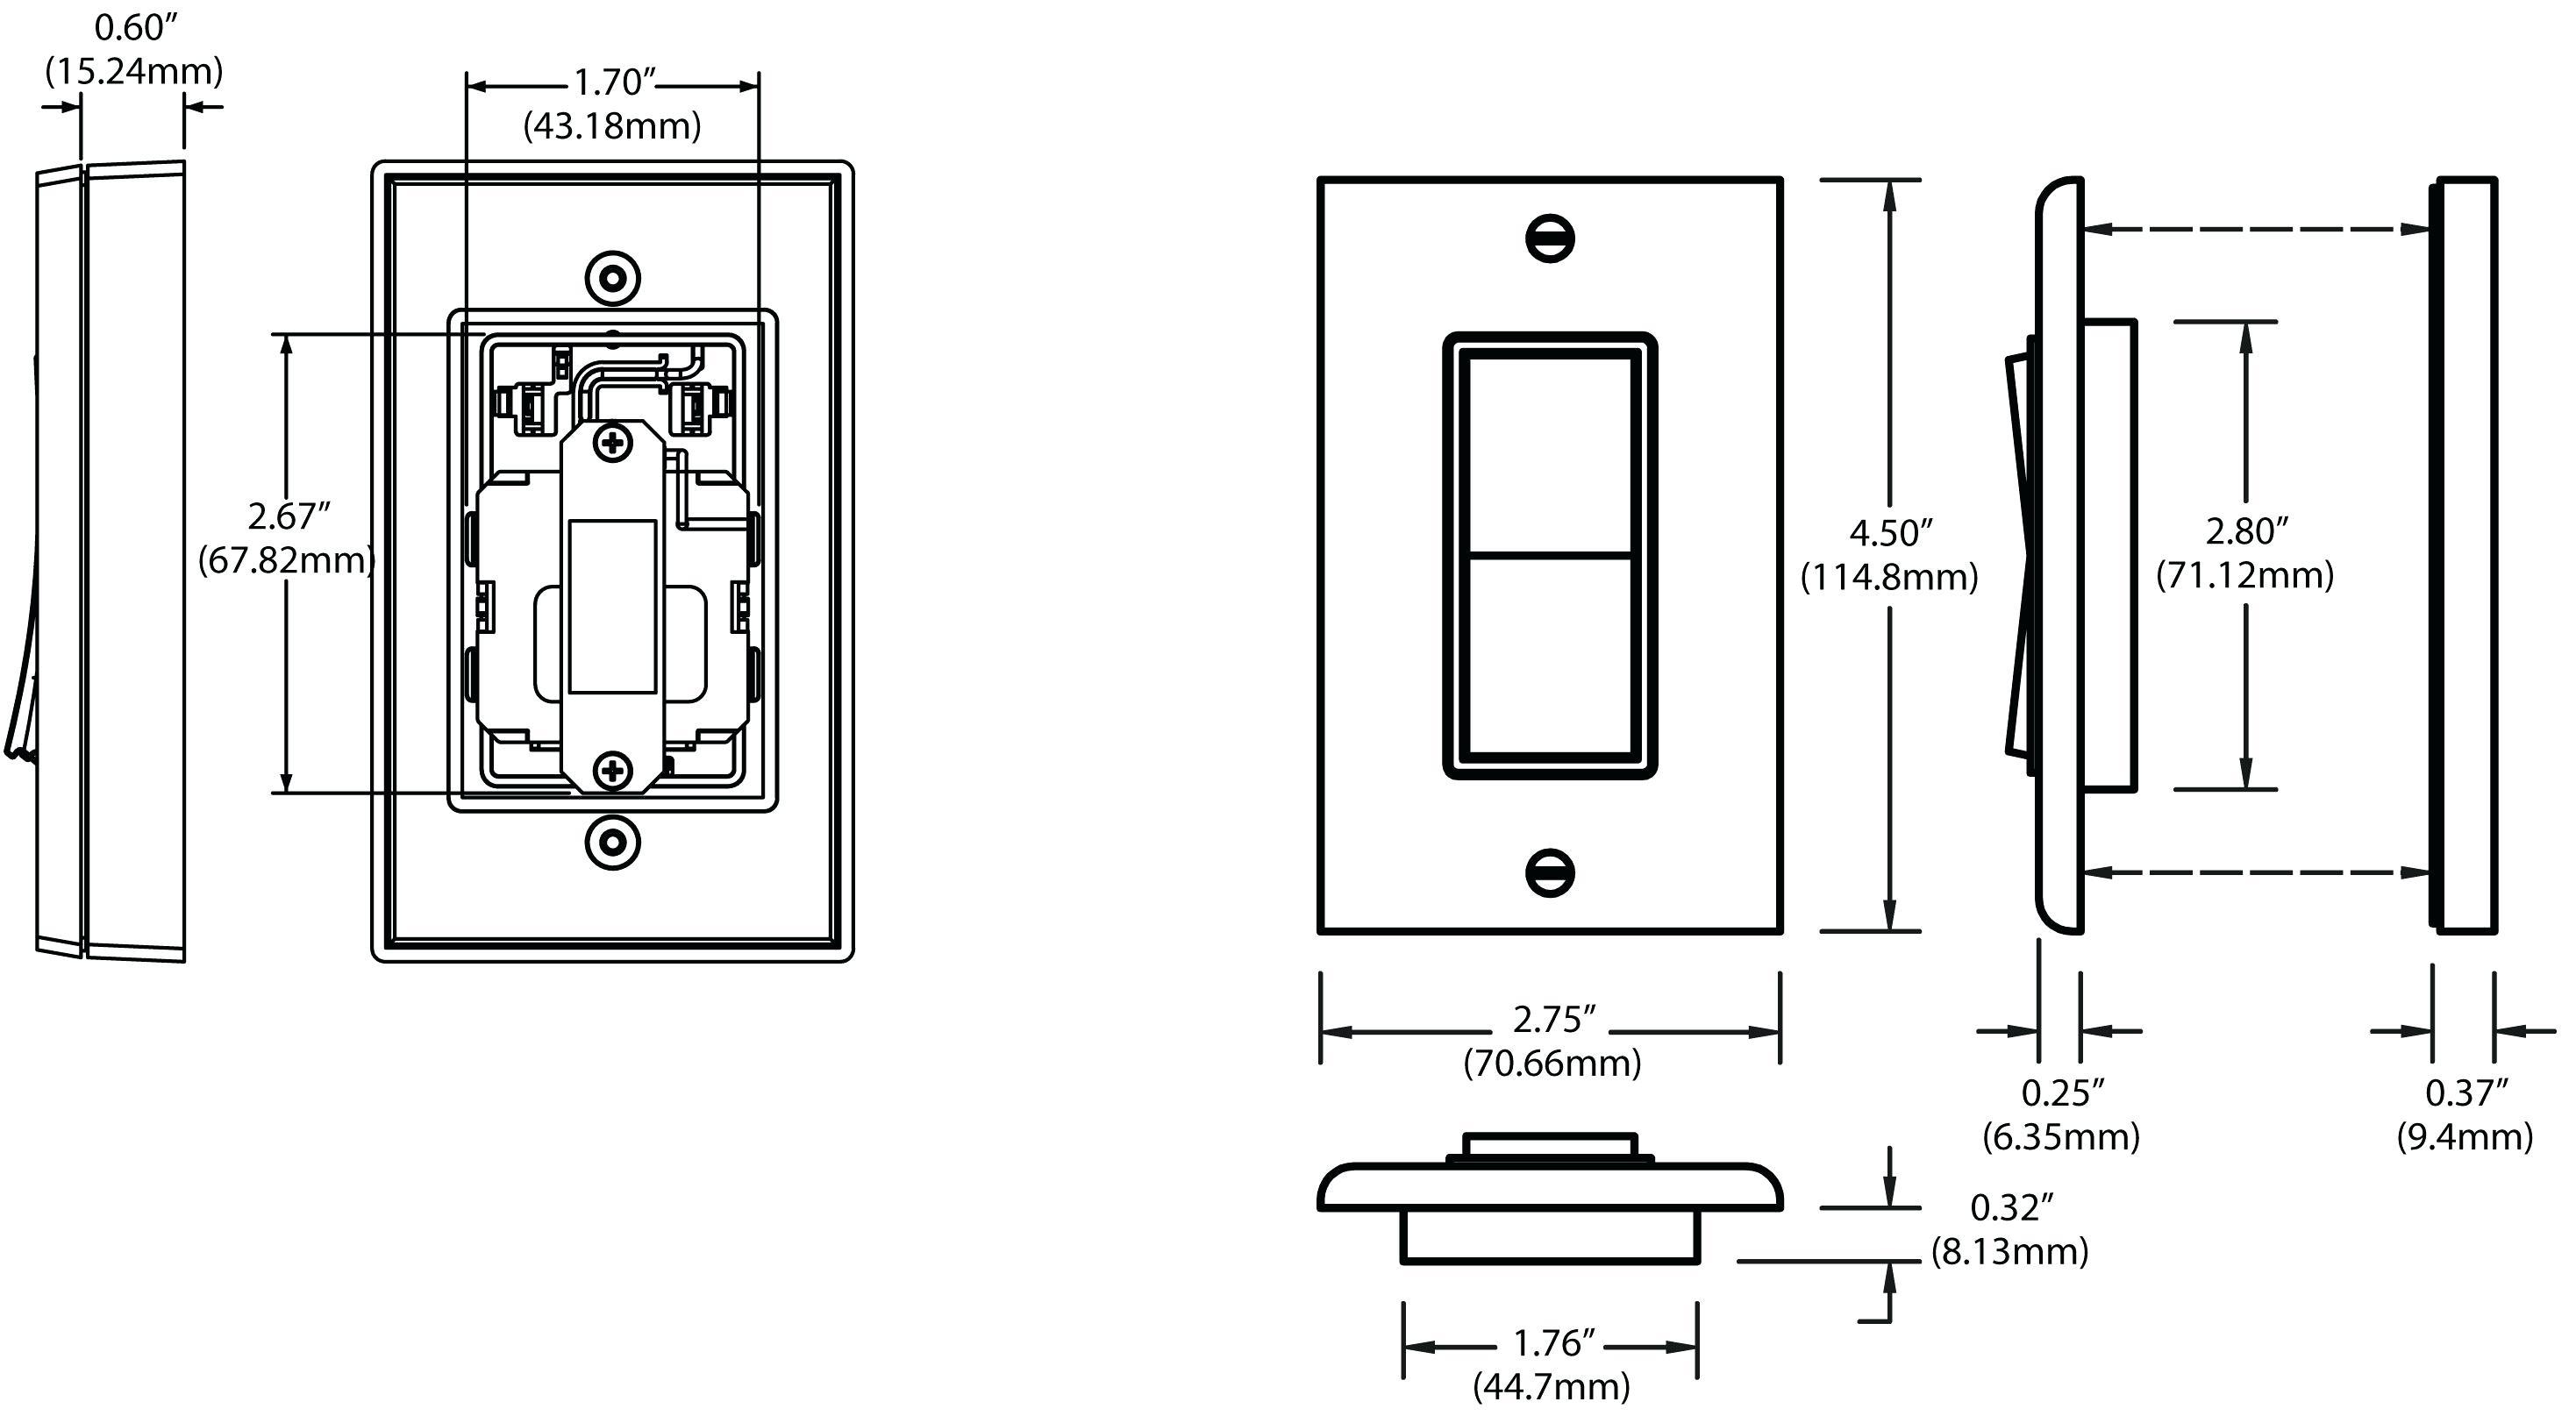 Leviton Dimmer Wiring Diagram 3 Way Copy Diagram Leviton 3 Way - Leviton Dimmers Wiring Diagram